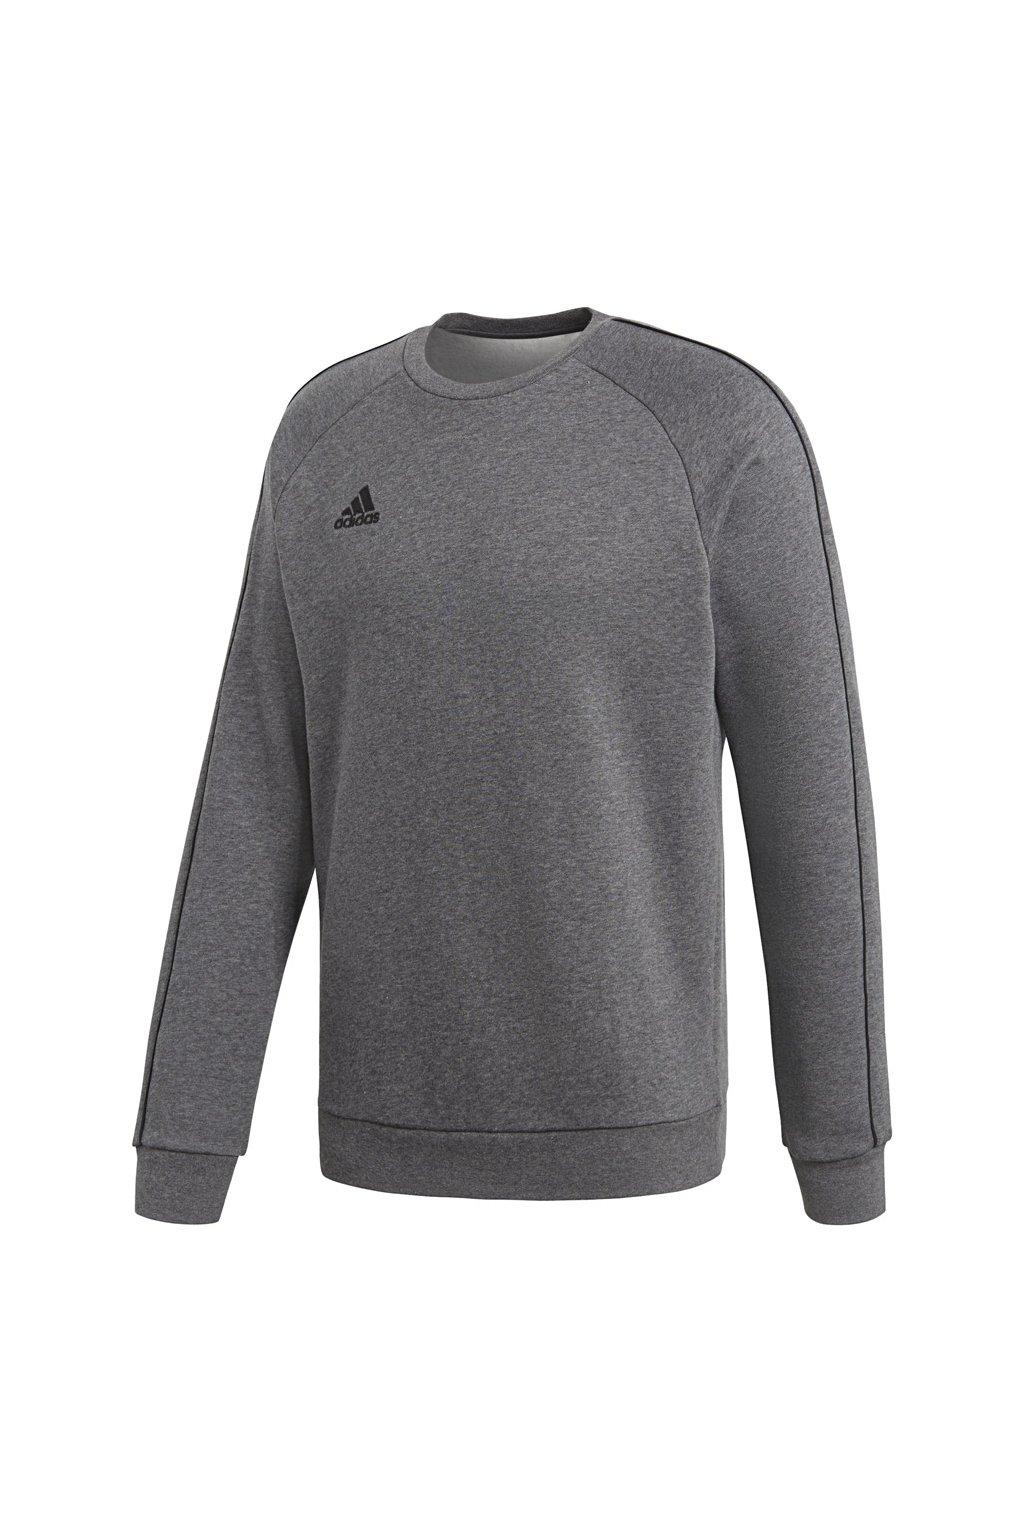 Pánska mikina Adidas Core 18 Sweat Top šedá CV3960